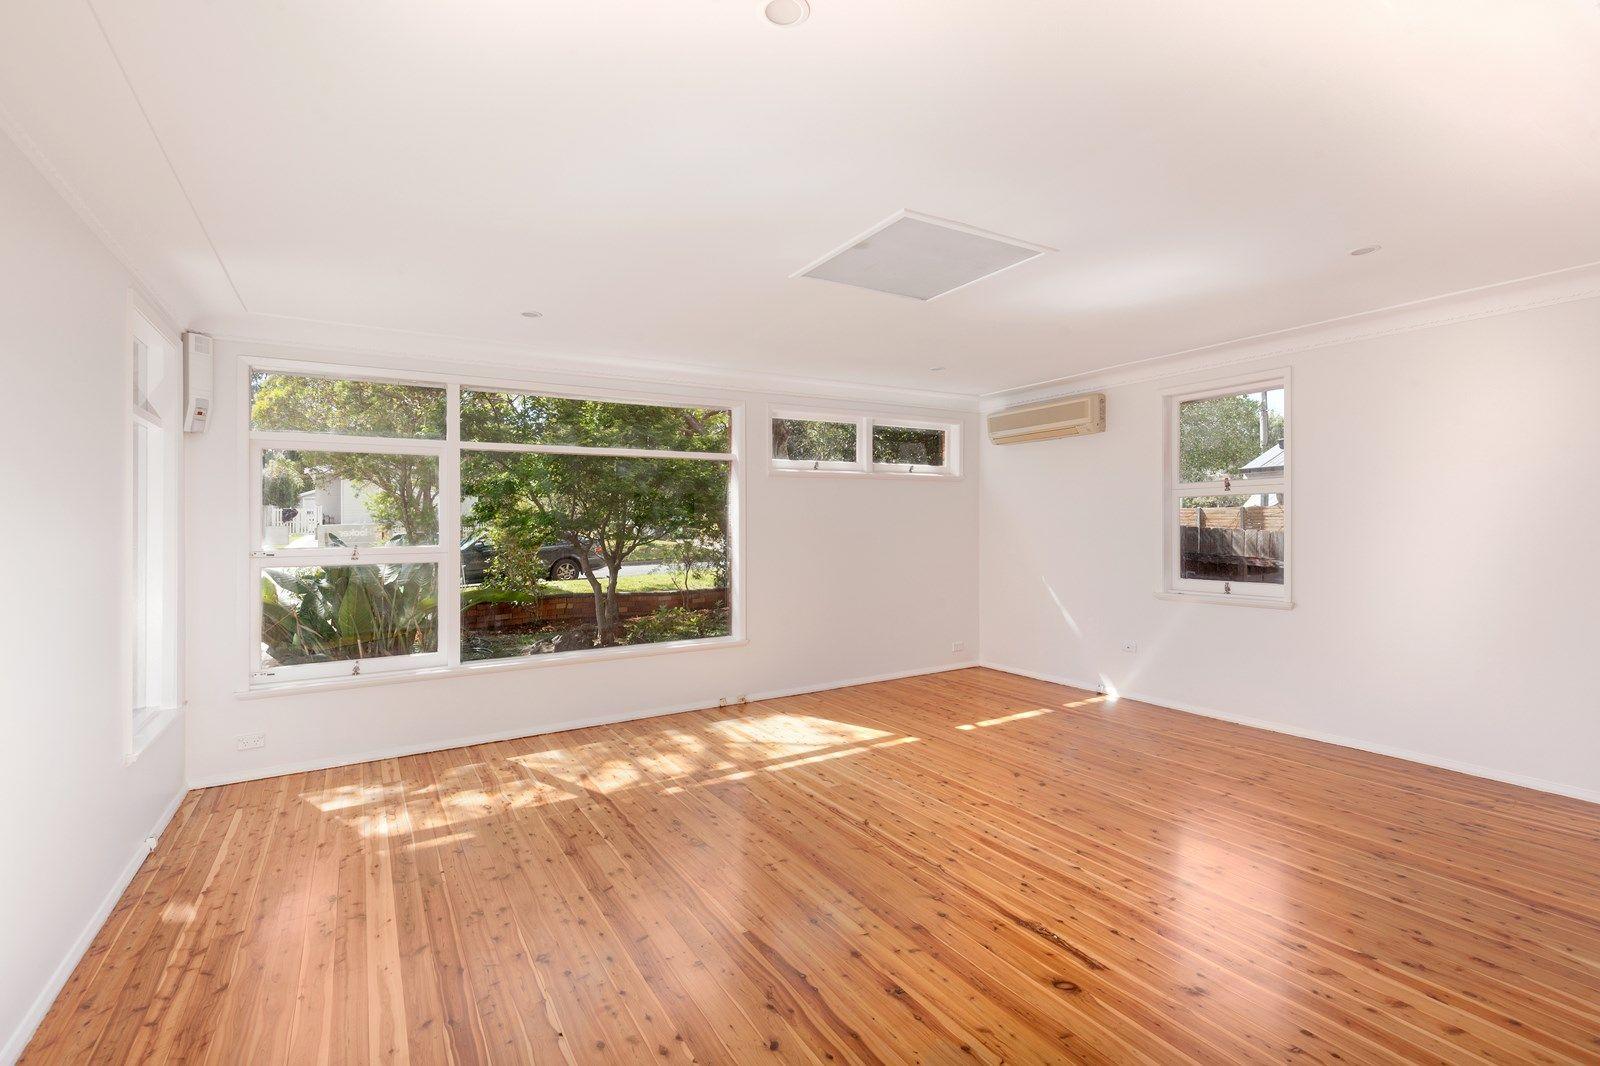 74 Fuller Street, Collaroy Plateau NSW 2097, Image 1